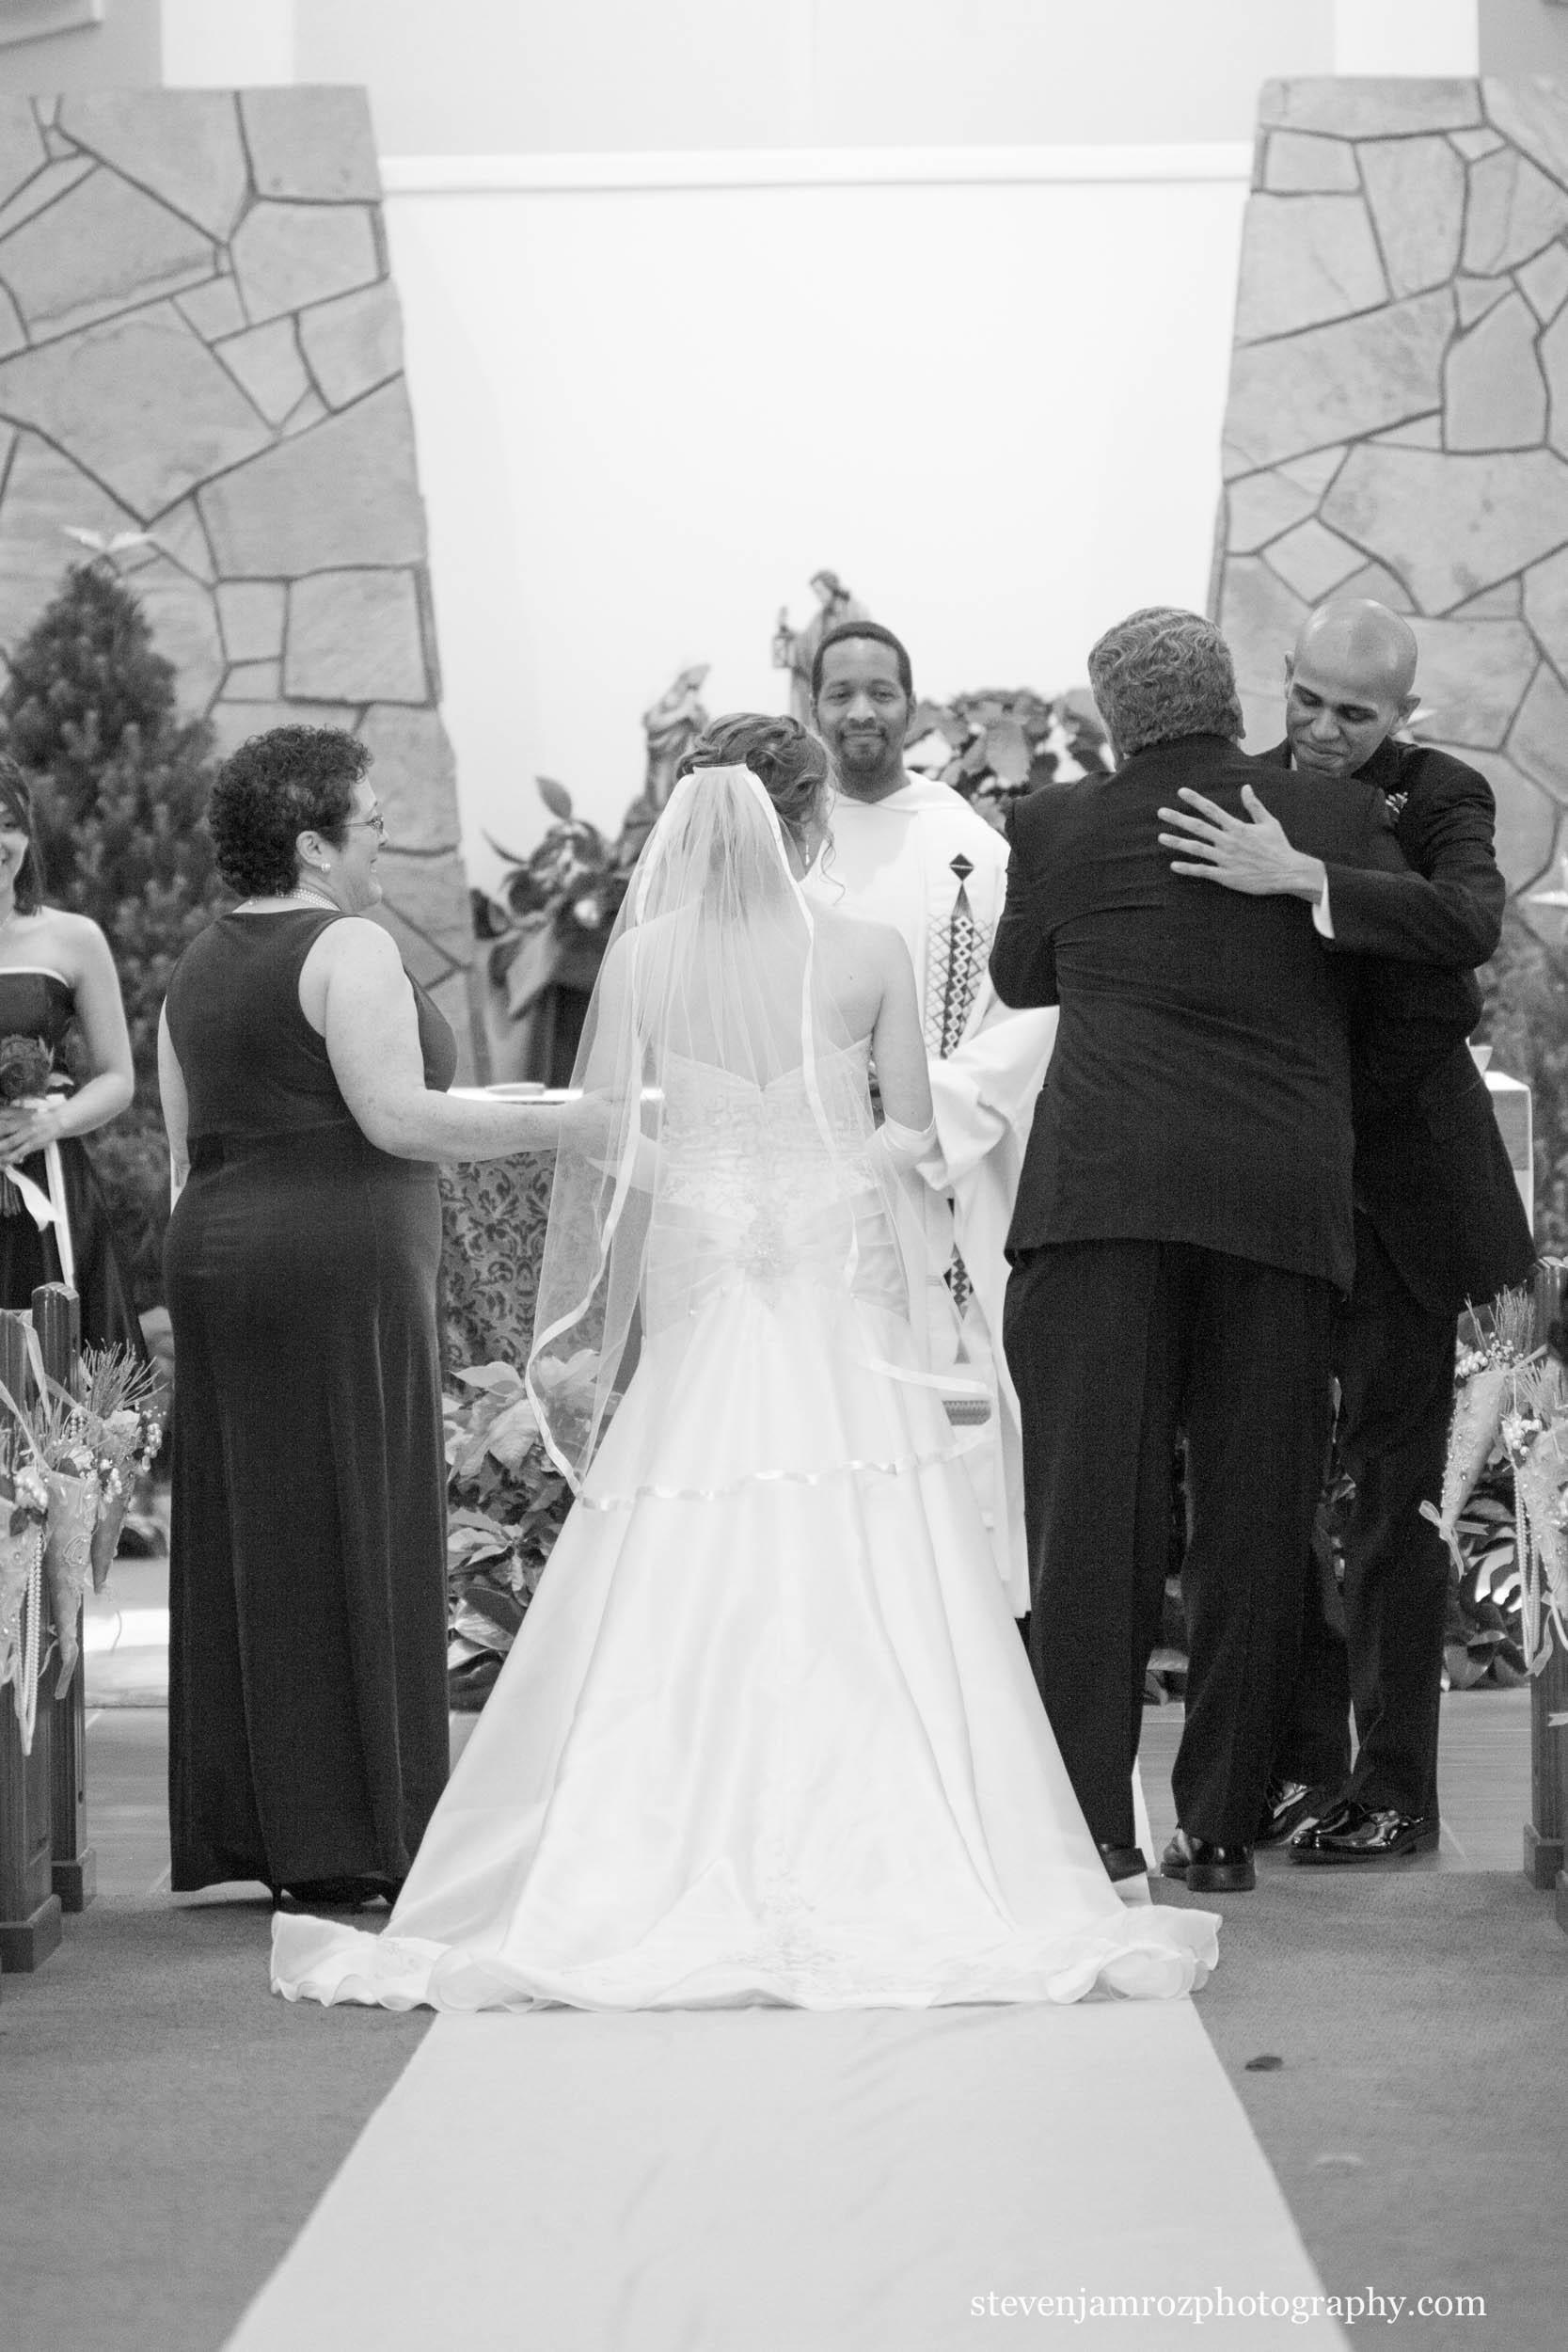 bride-groom-walk-raleigh-steven-jamroz-photography-0593.jpg